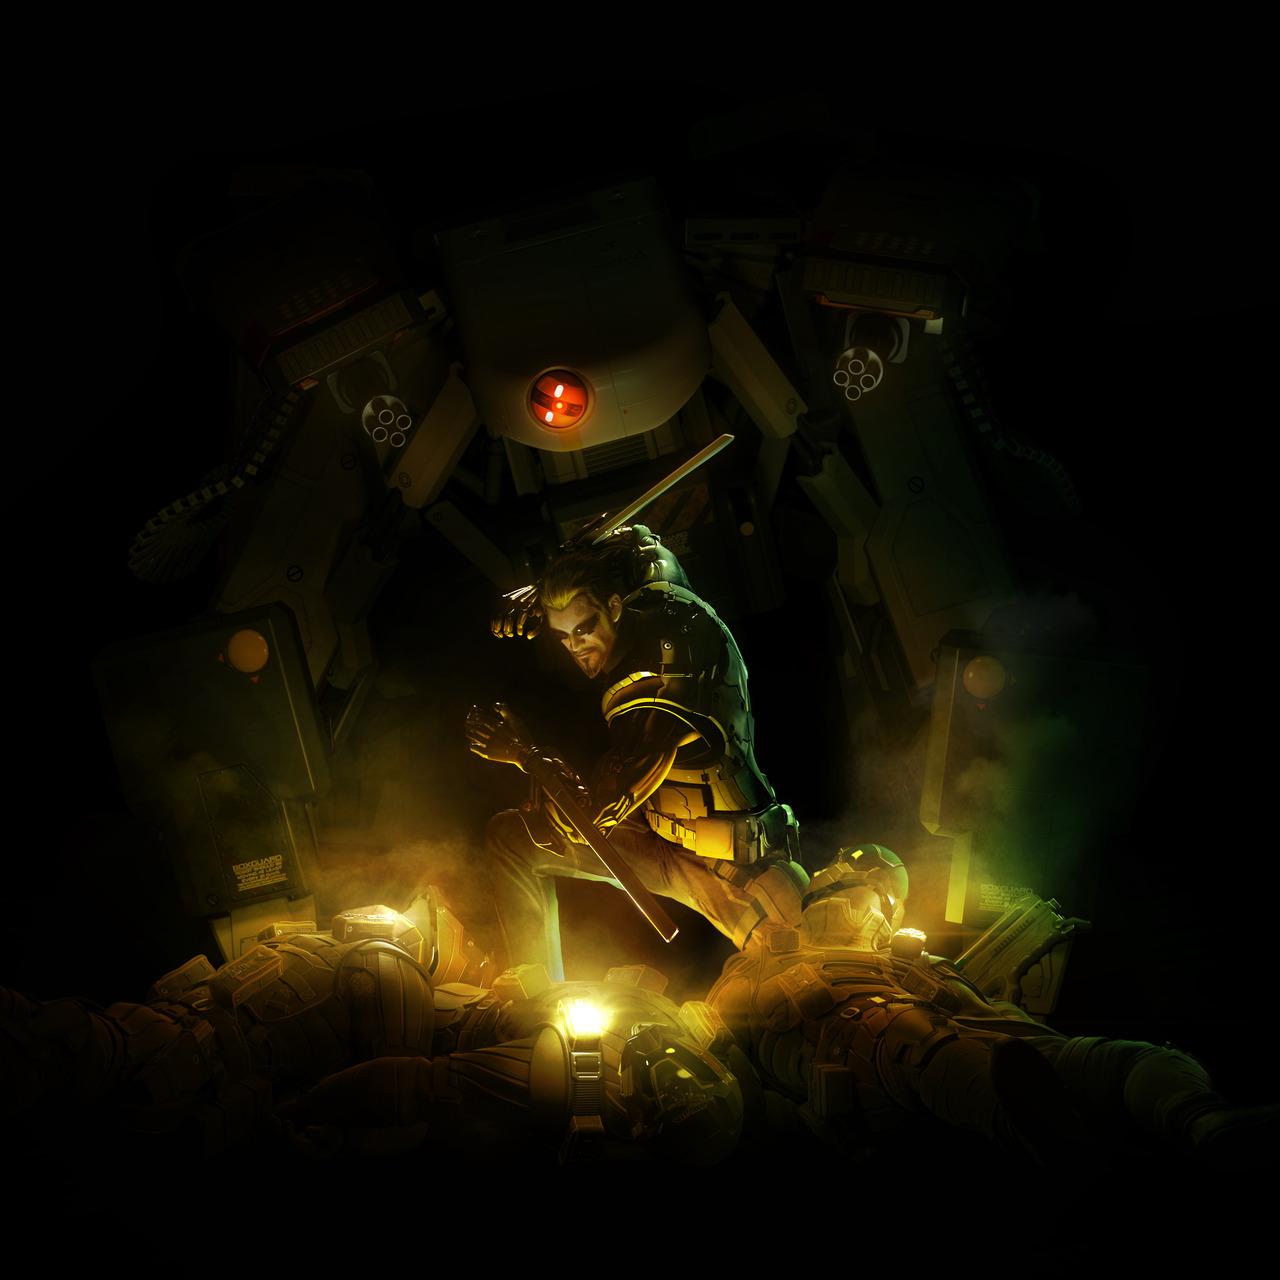 E3 2011 Galerie: Deus Ex: Human Revolution 43926